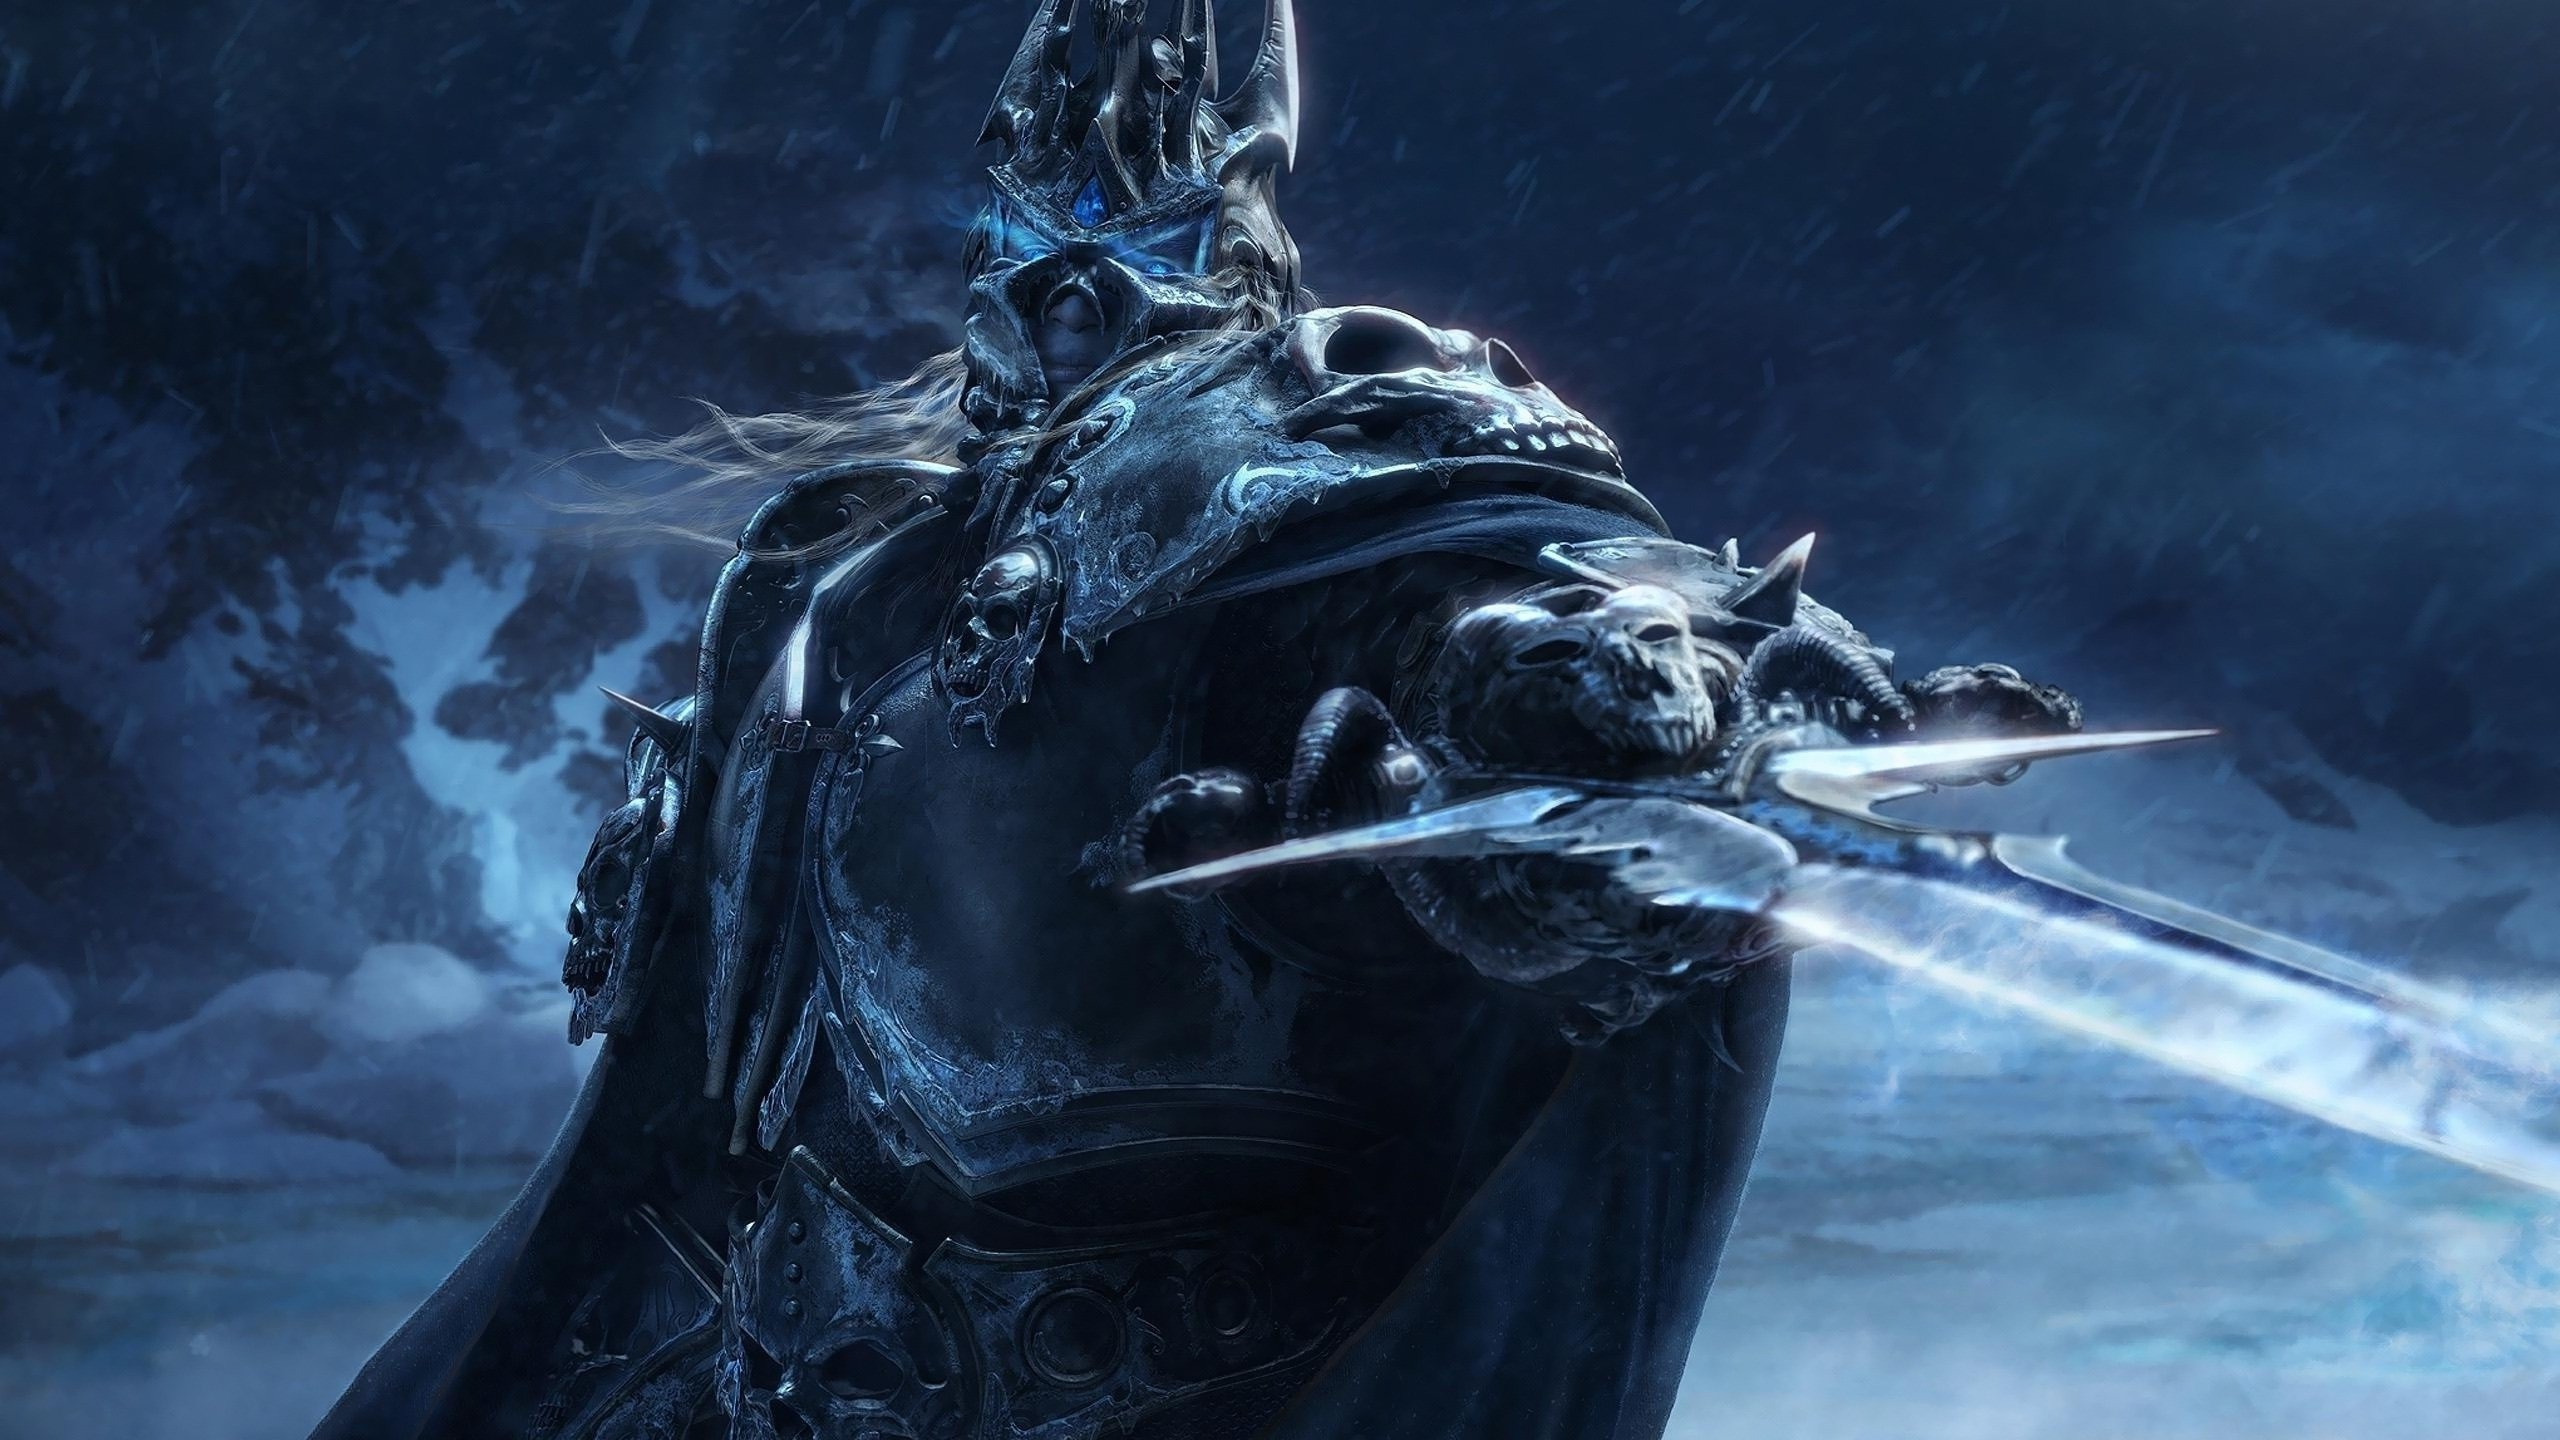 World Of Warcraft Wow Wallpapers 2560x1440 Desktop Backgrounds